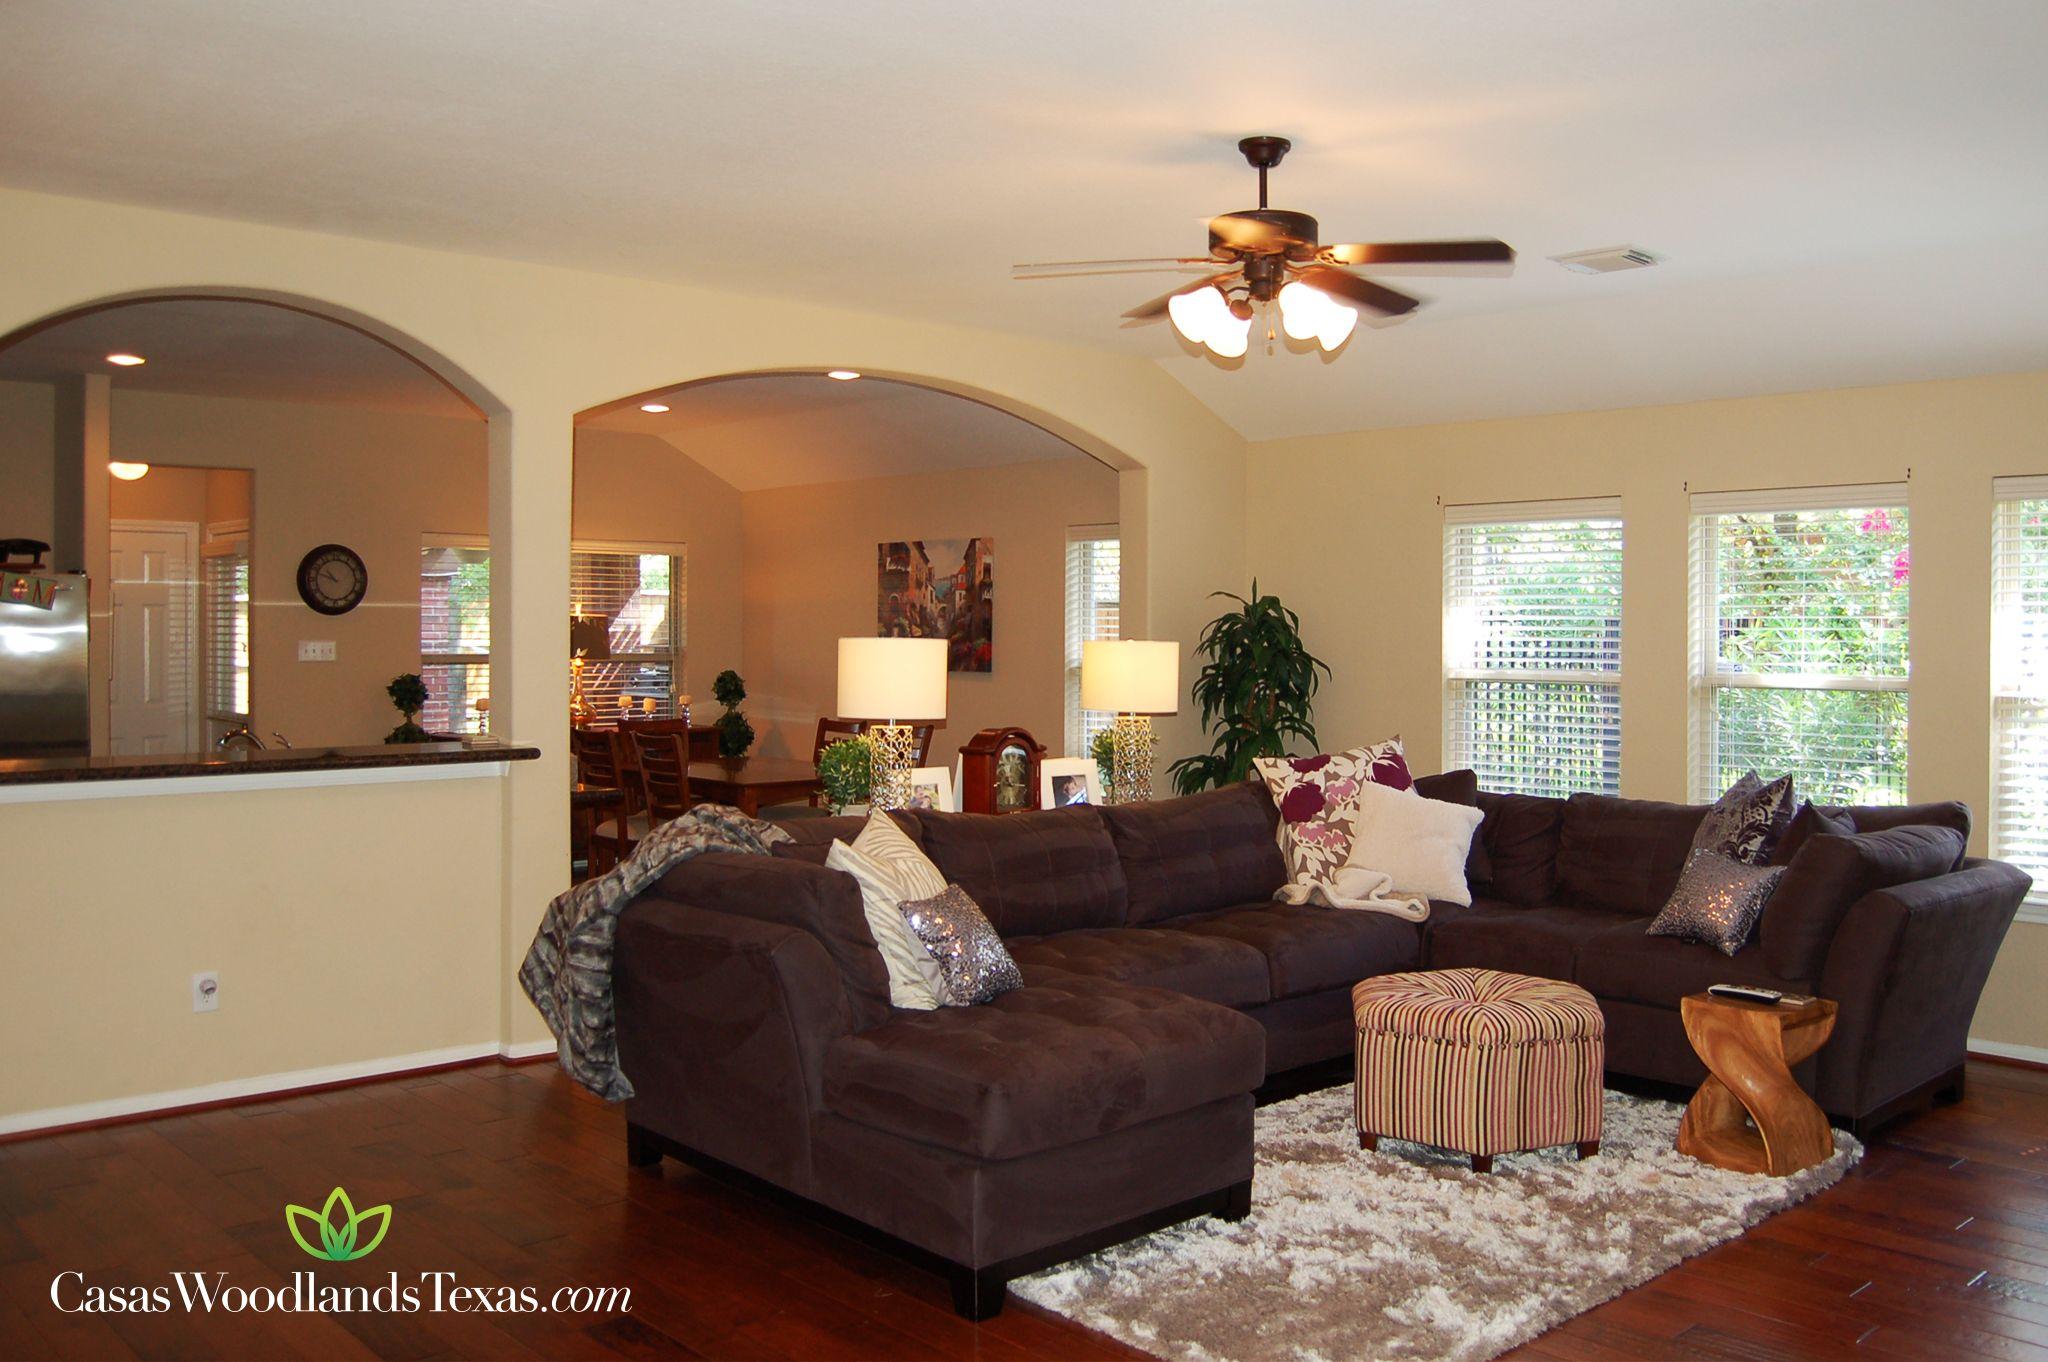 amplia sala con pisos de madera duela pisos decoracin